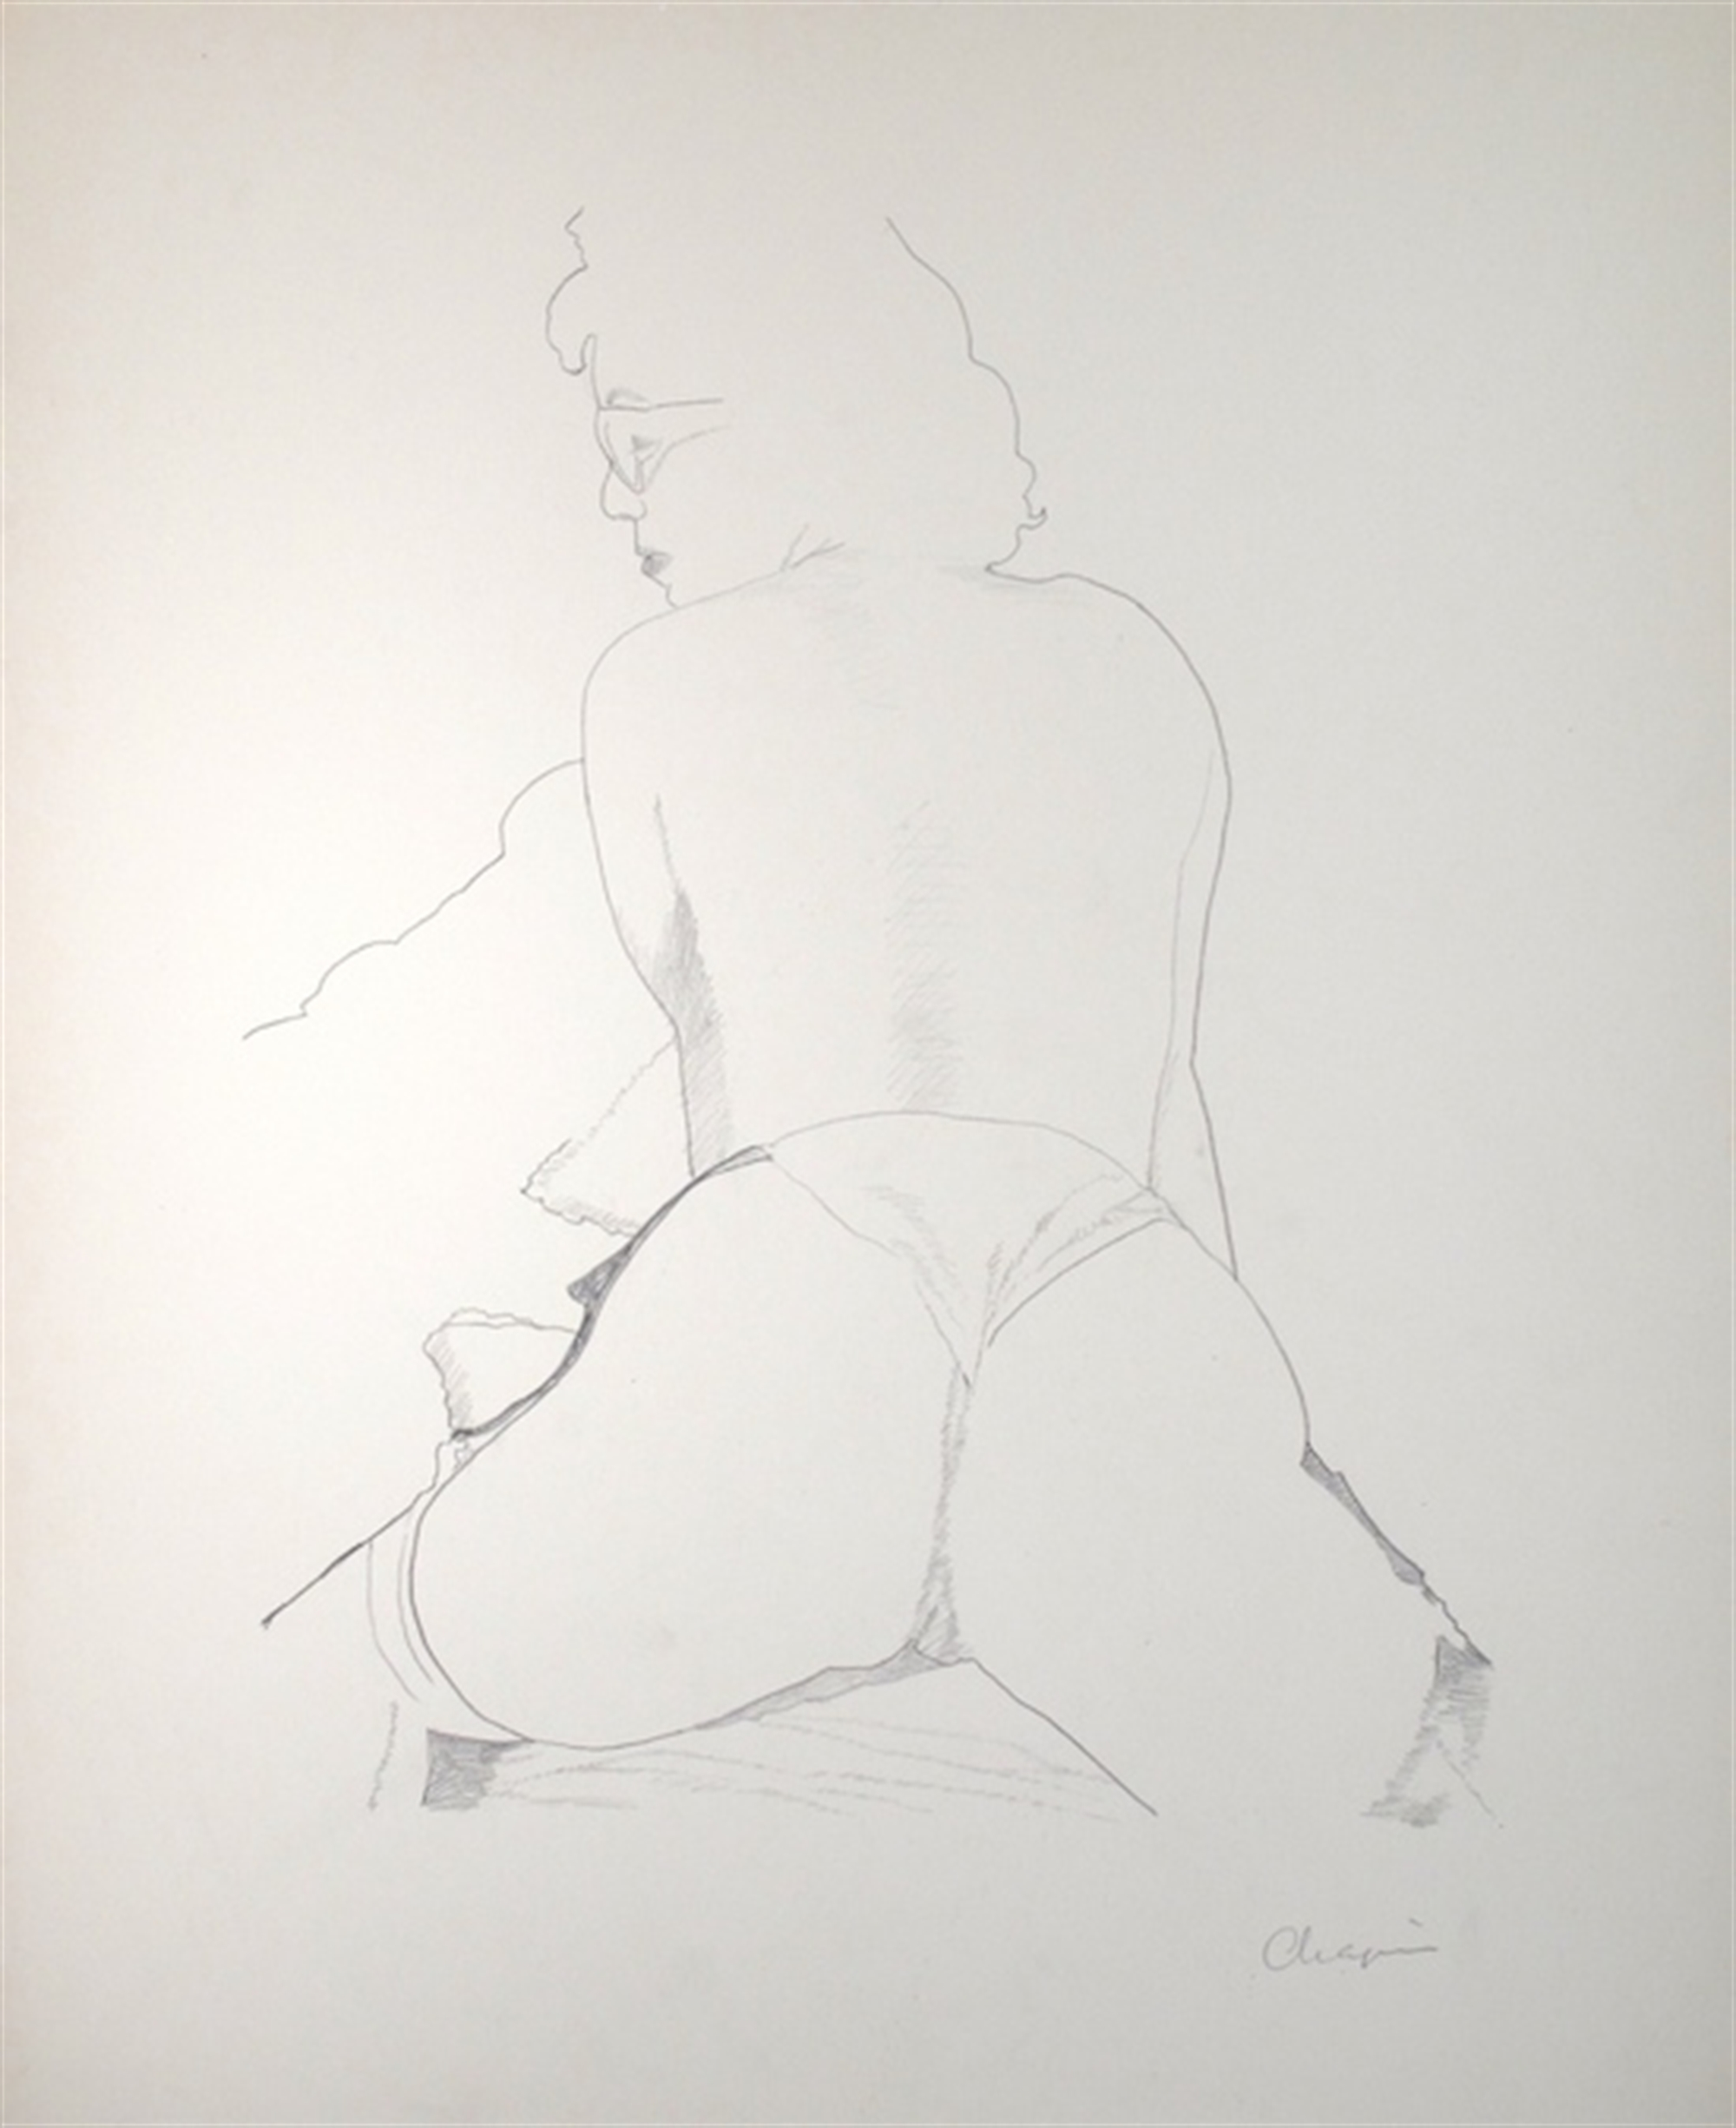 Legs Spread (Rear View) by David Chapin